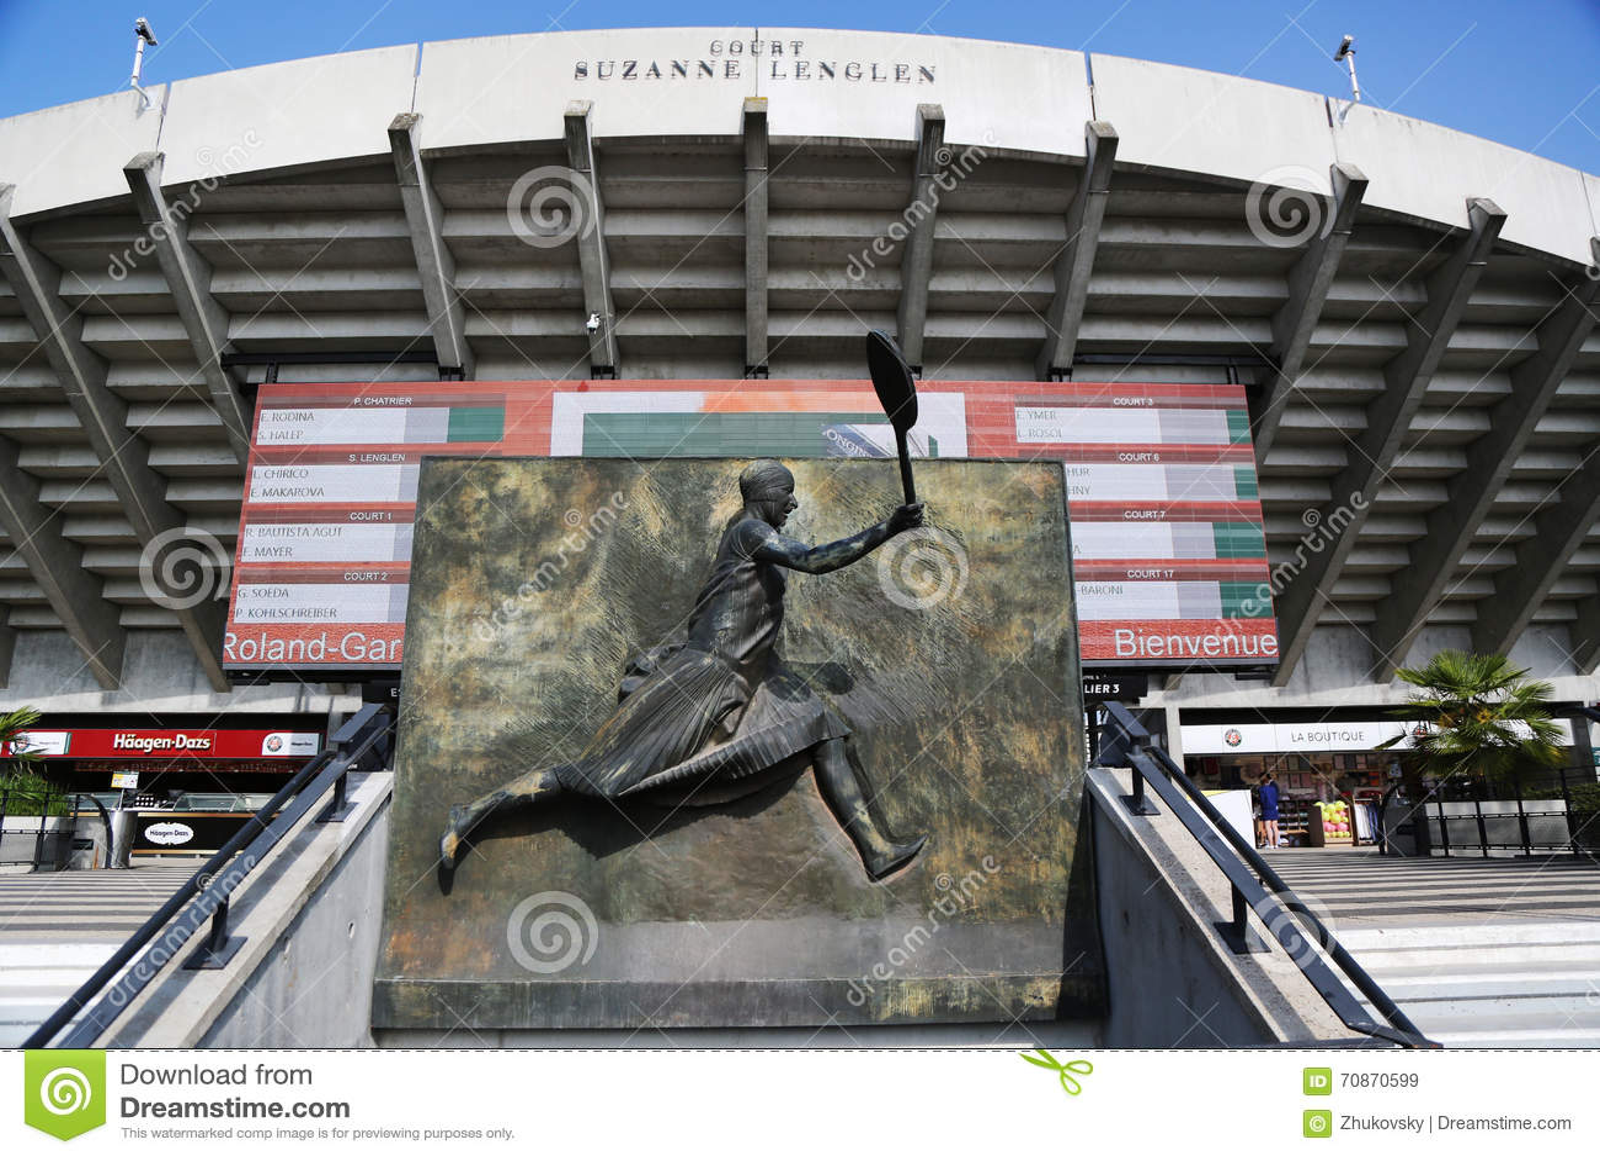 Court Suzanne Lenglen At Le Stade Roland Garros During Roland